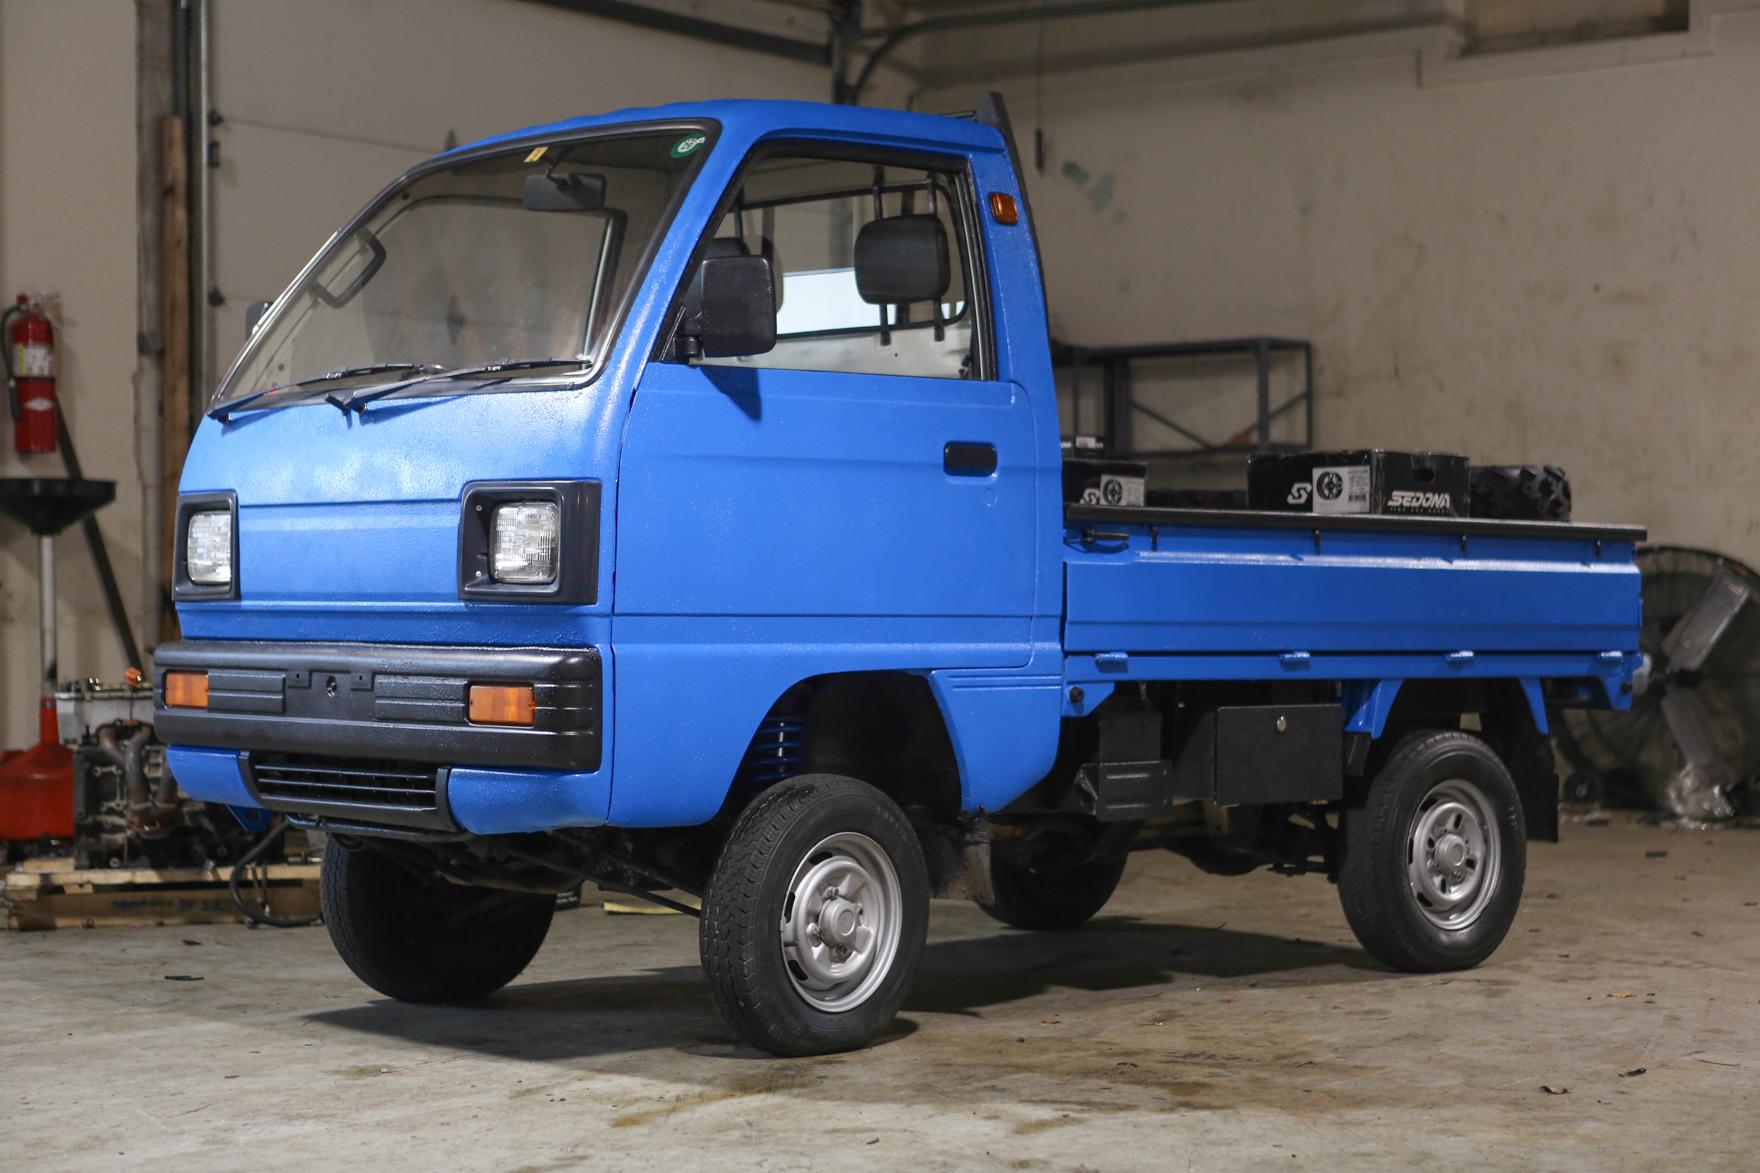 1988 Suzuki Carry 4WD - $5,600